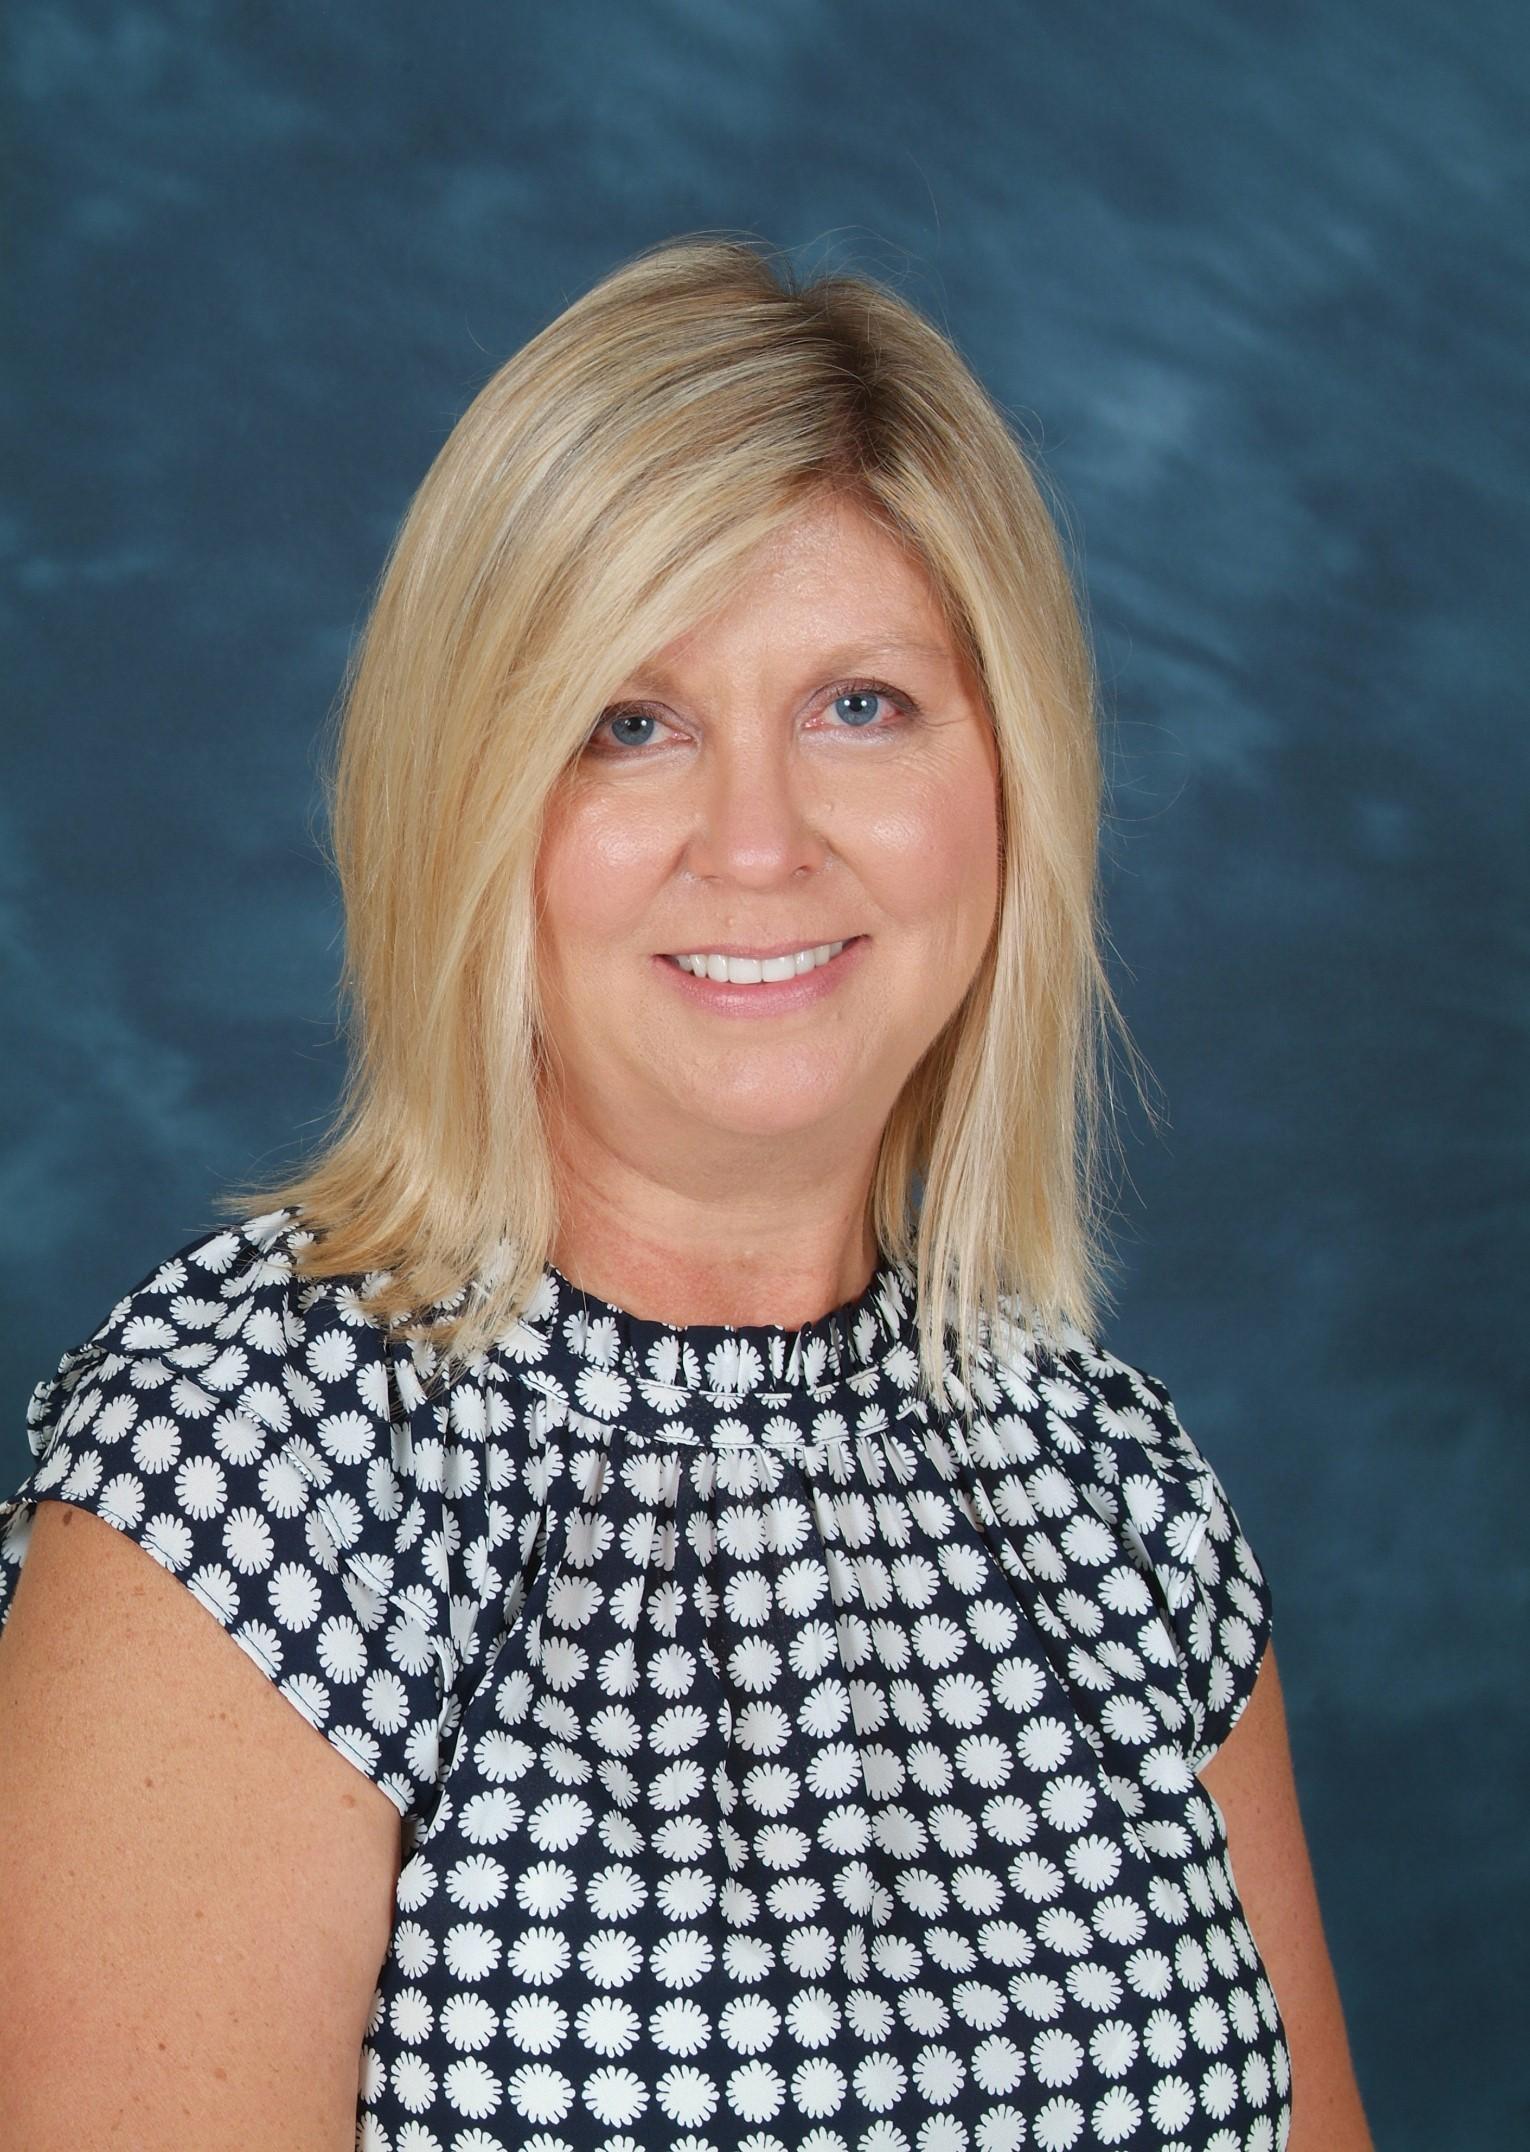 Lisa Worthy